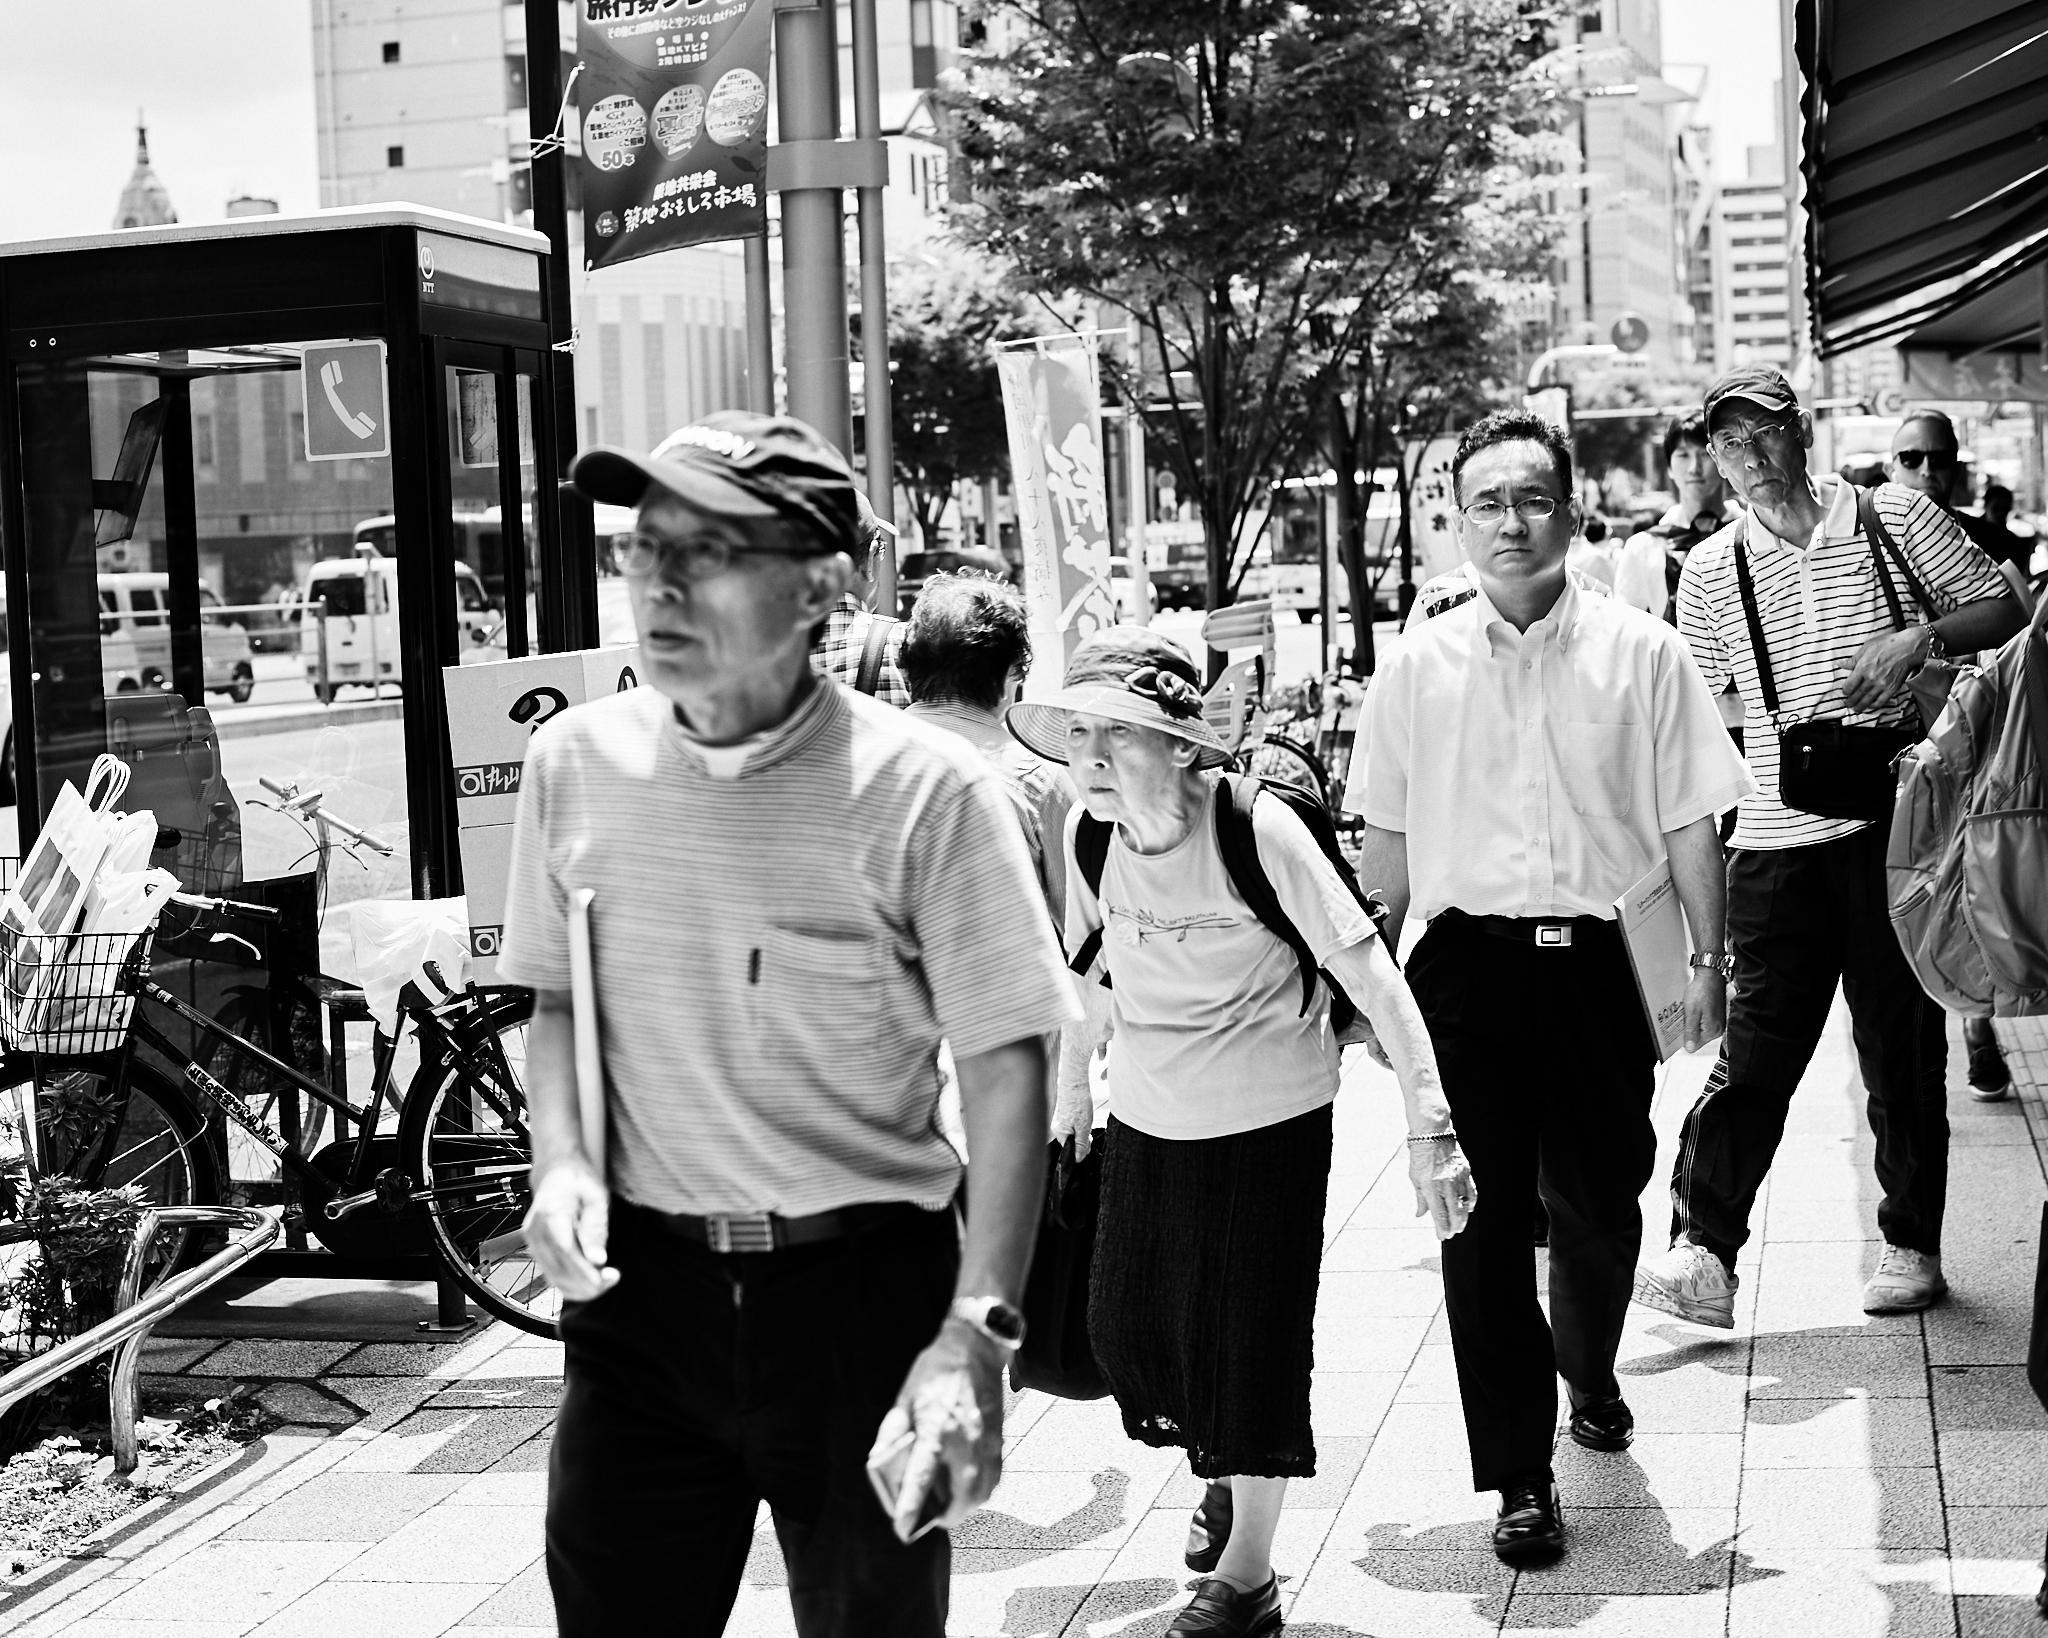 SnapPilots_17-07-05_Tokyo2017_bnw_45.jpg